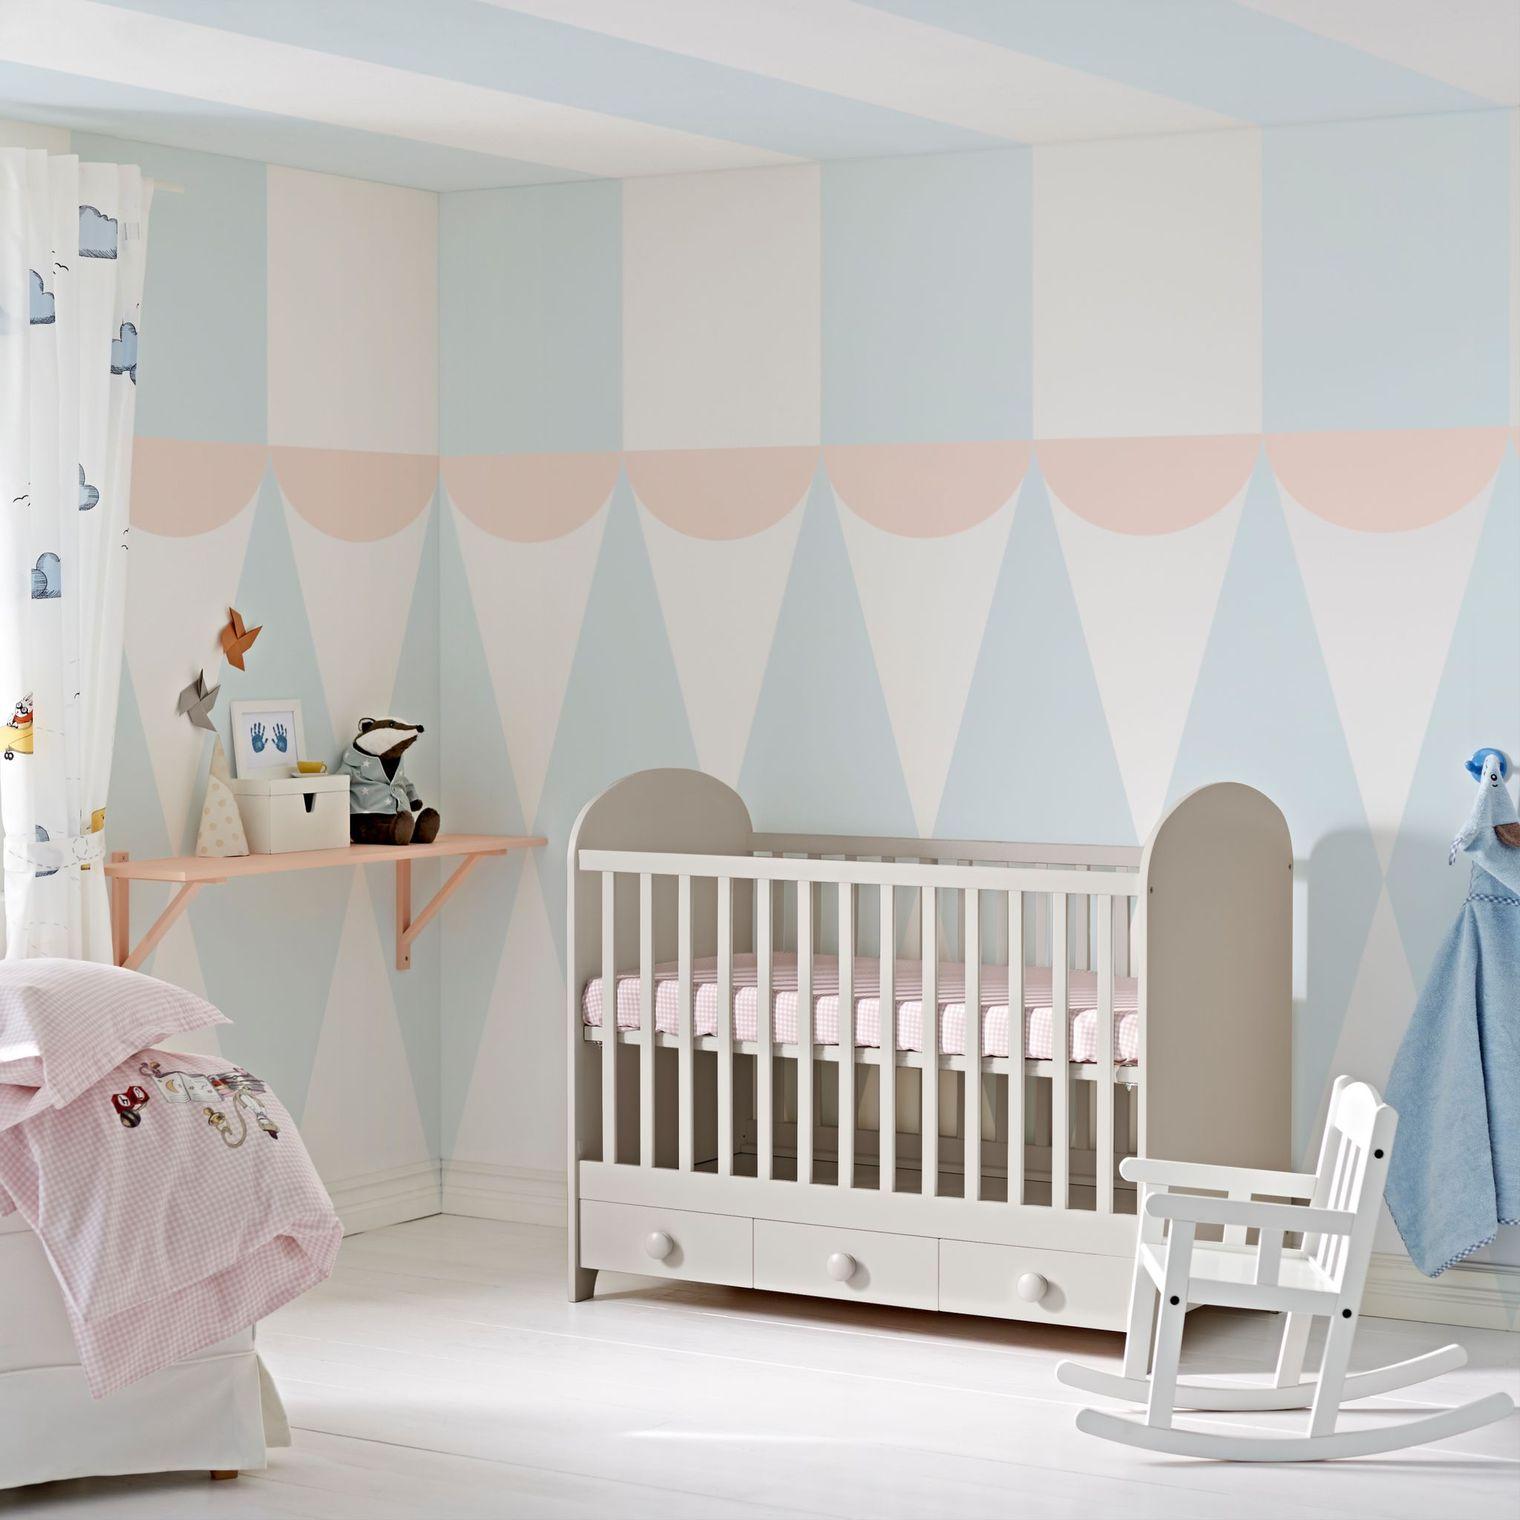 choisir la peinture de la chambre